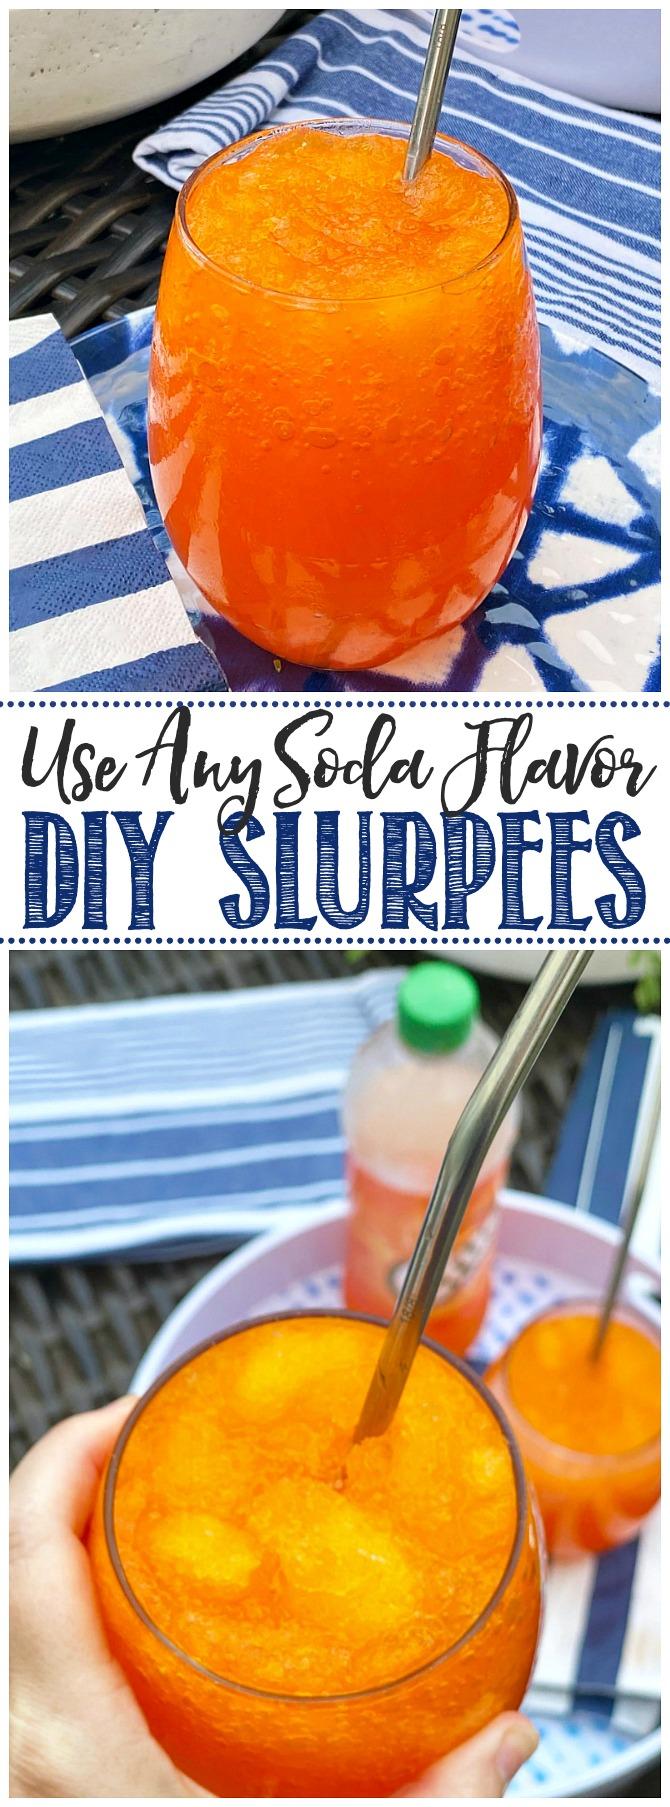 DIY slurpees made with soda.